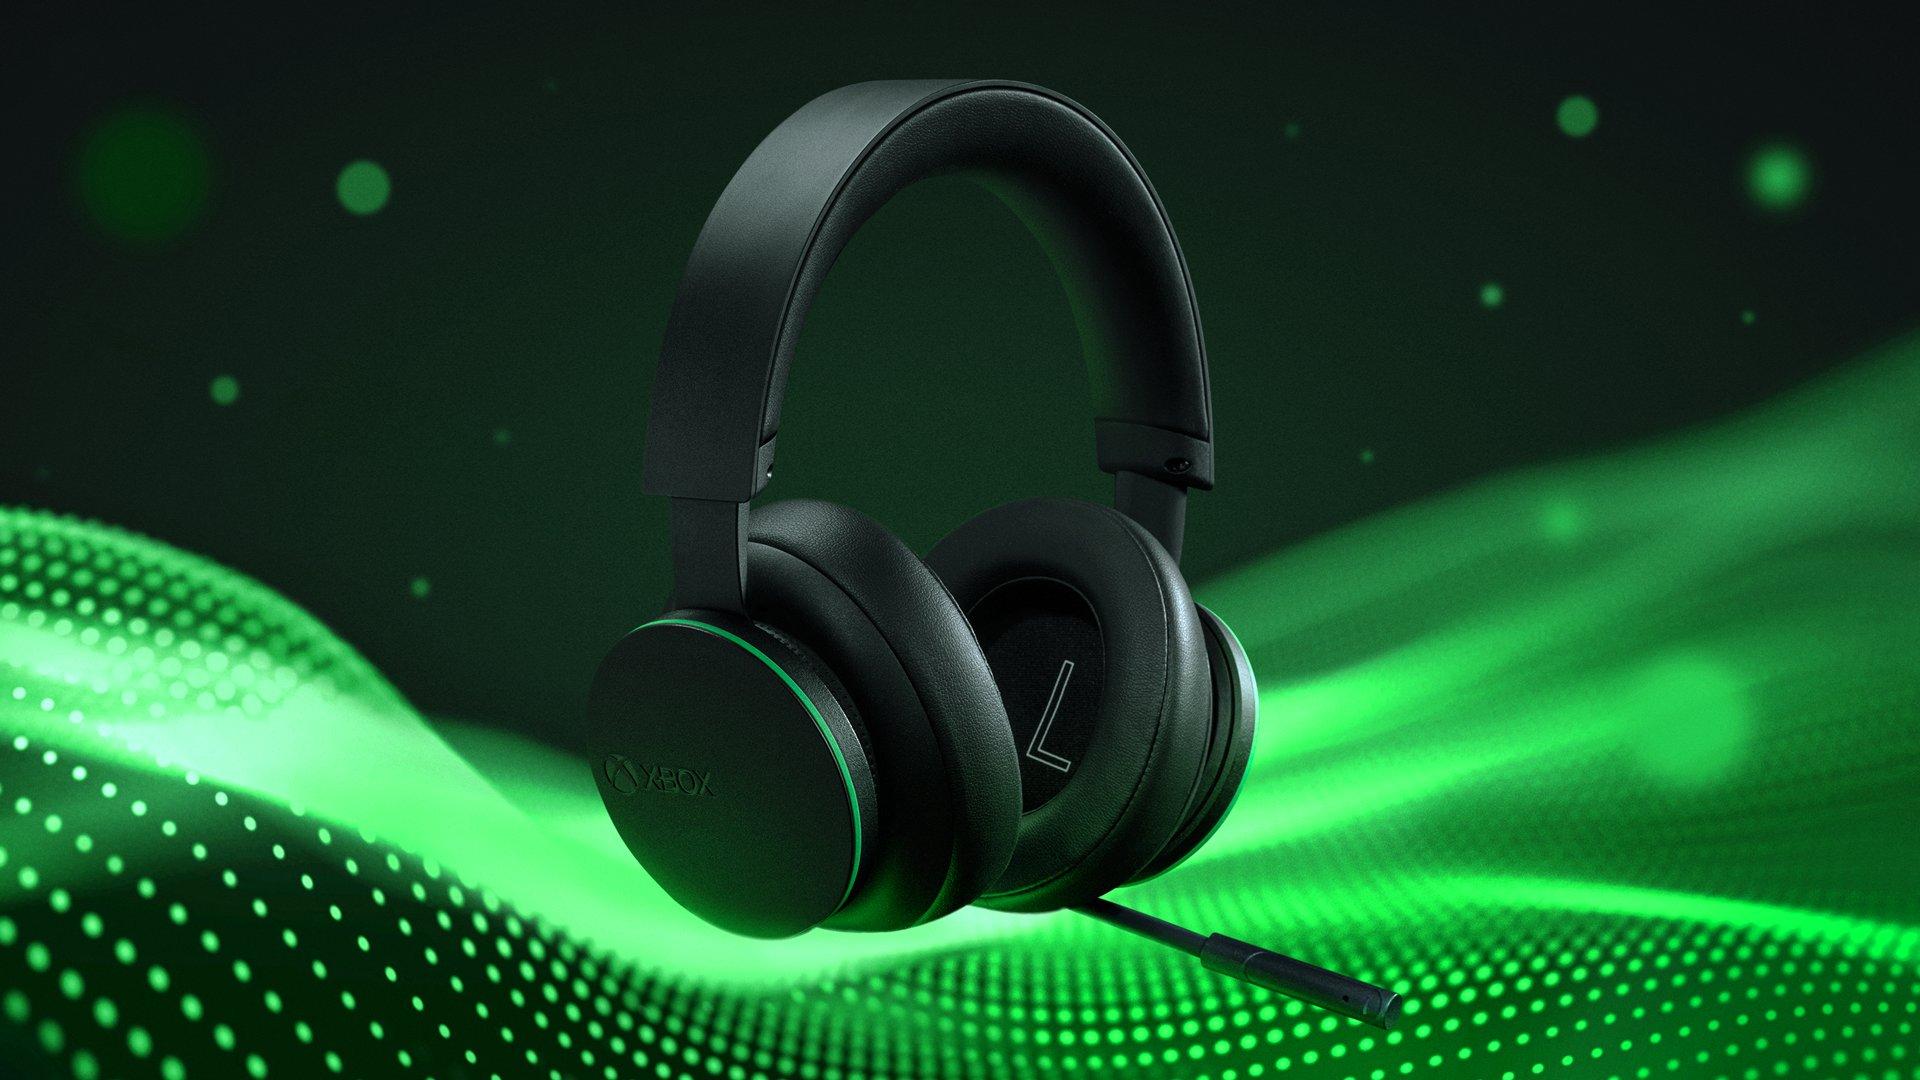 Xbox Wireless Headset: 6 Monate Dolby Atmos-Testphase inklusive - Xboxdynasty